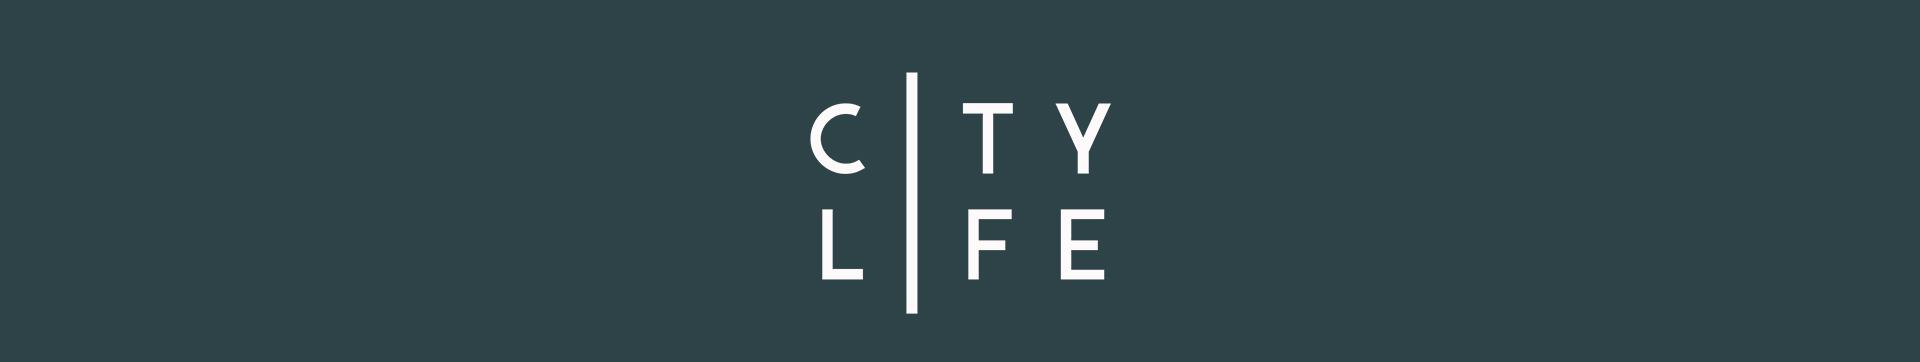 citylife main logo.jpg